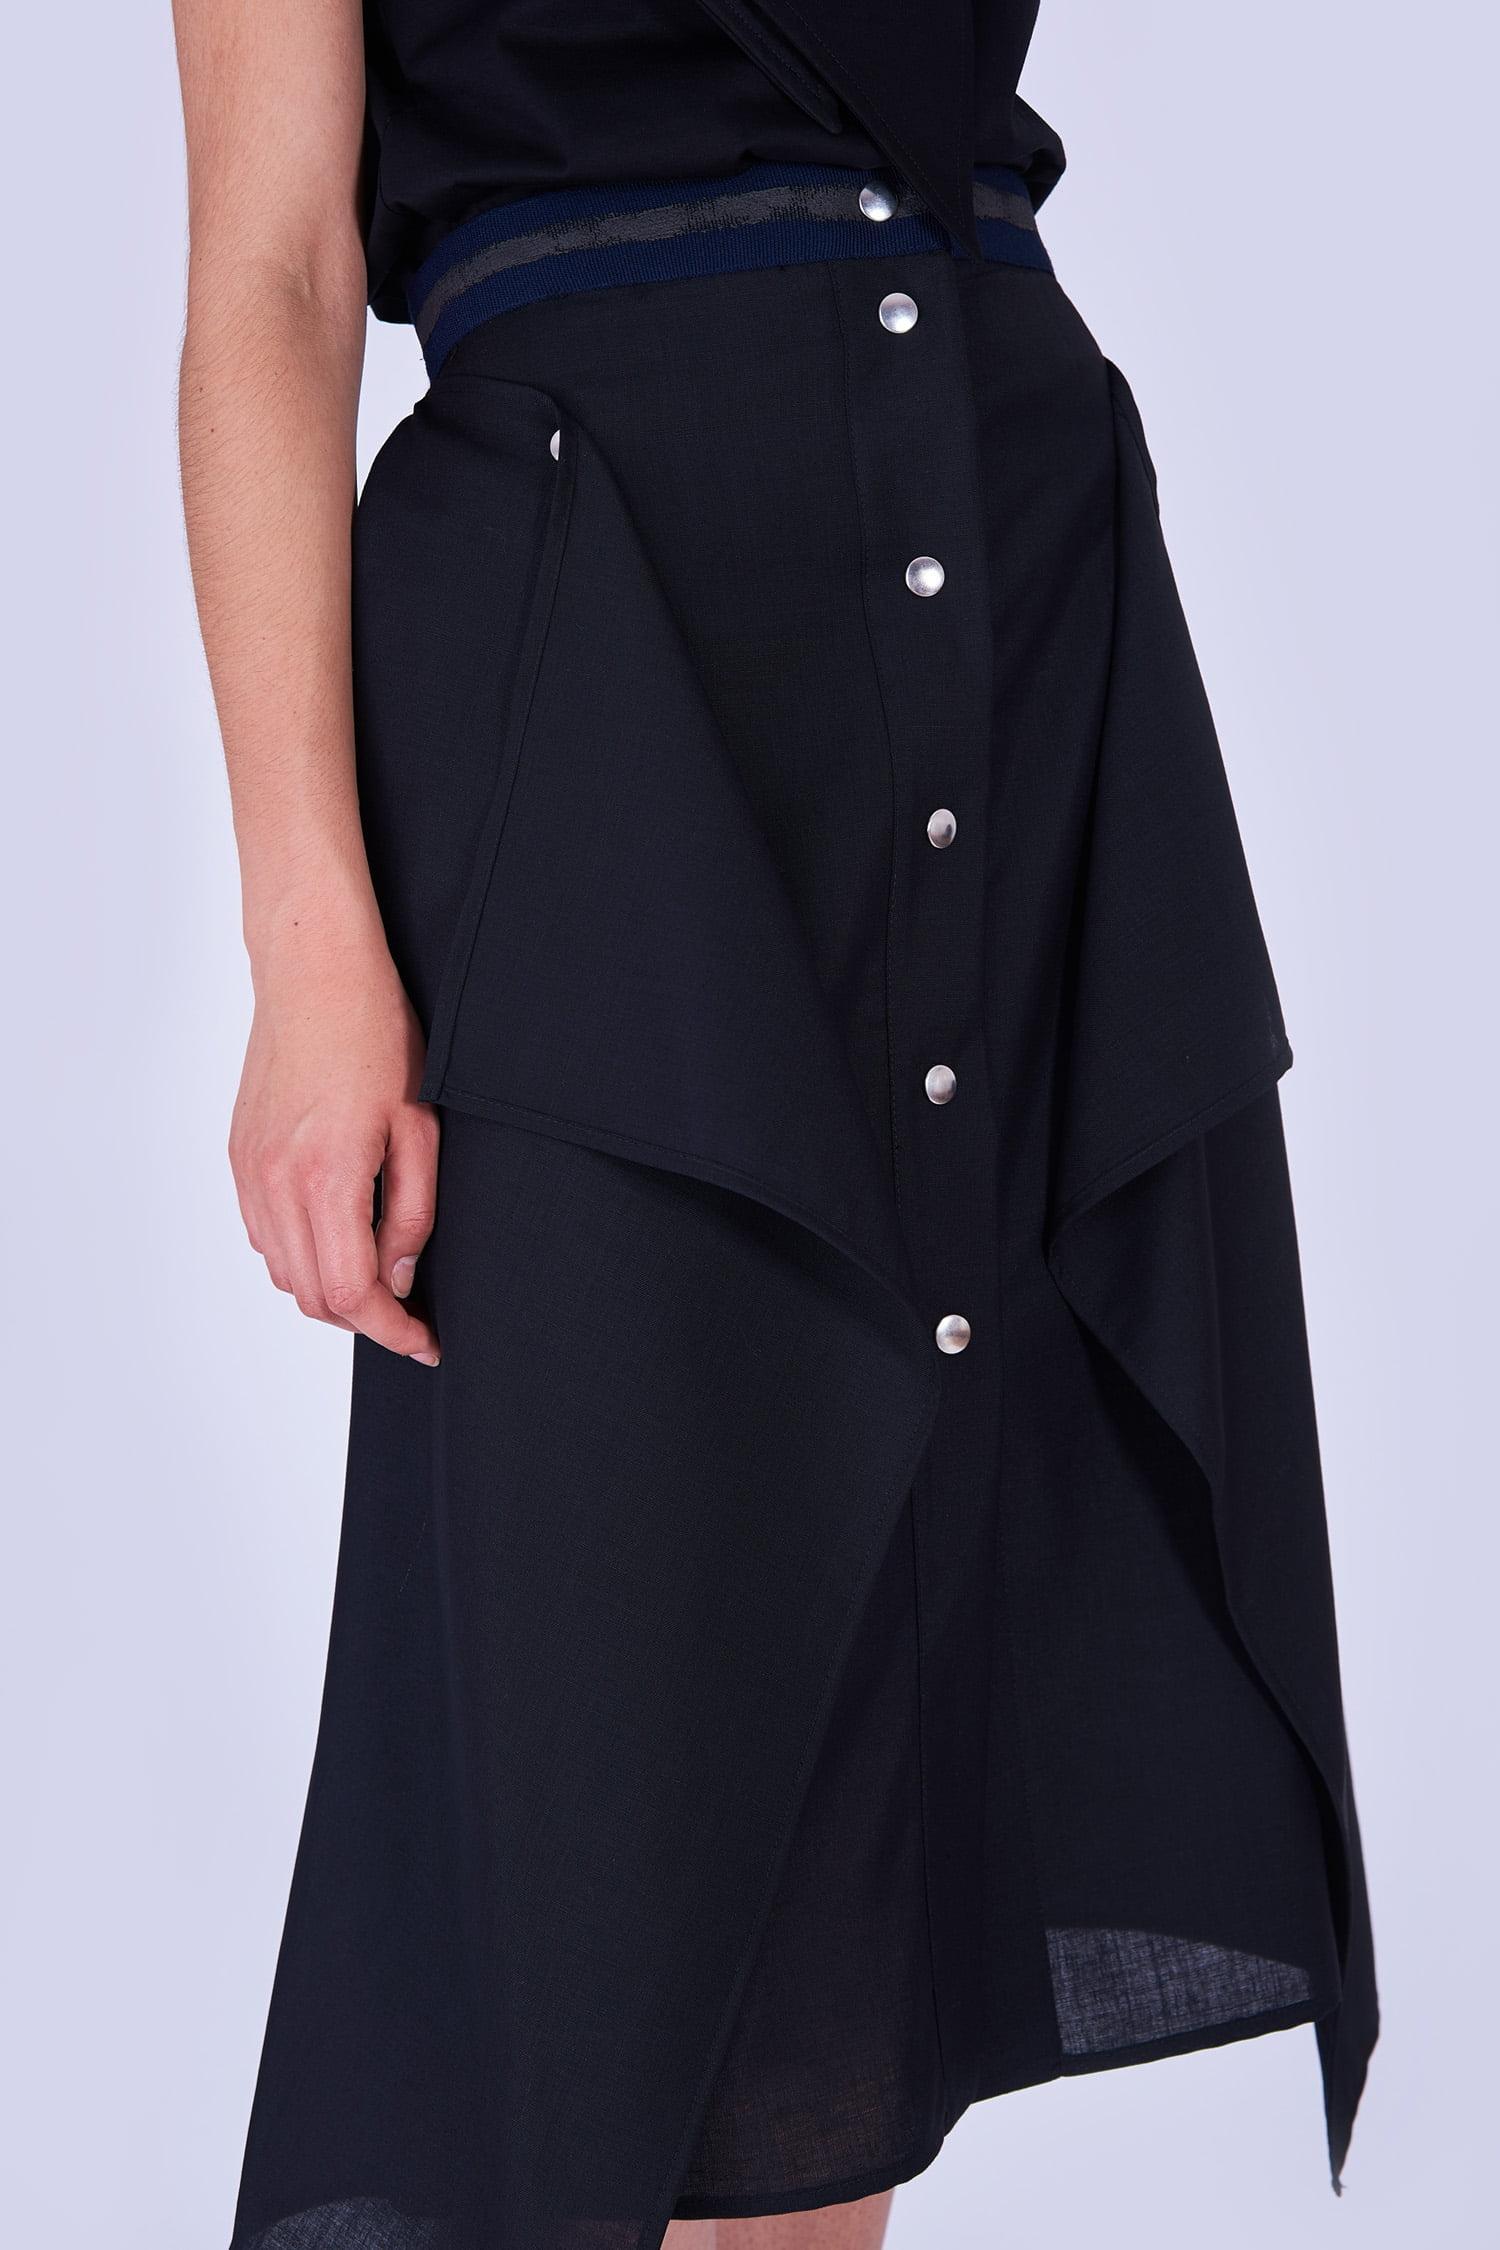 Acephala Fw19 20 Black Skirt Draped Czarna Spodnica Drapowana Detail 2